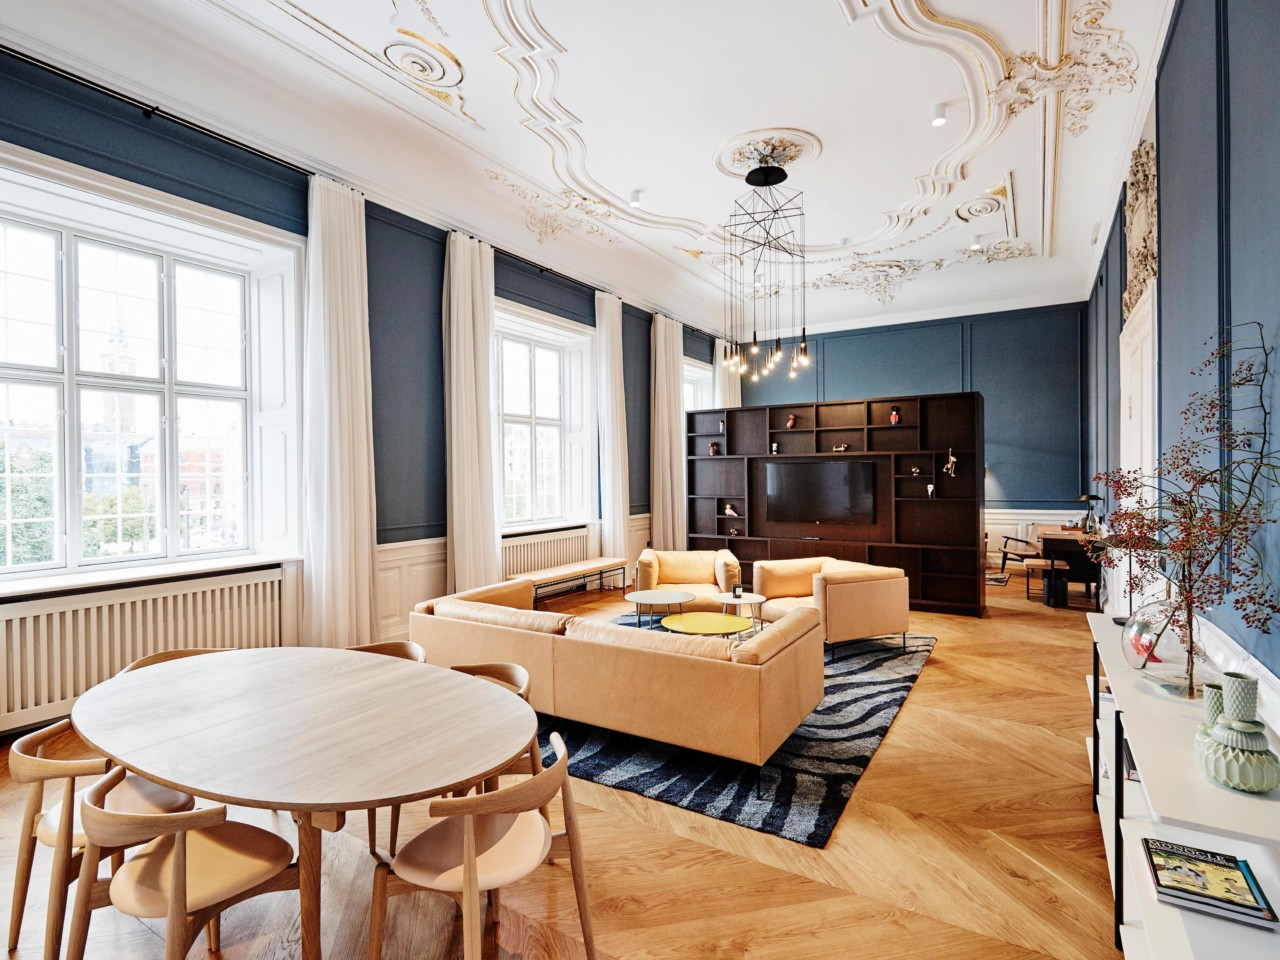 SLEEP_  NOBIS.  #ClassicDesign #Interiors #Natural #NobisStockholm   https://nobishotel.dk/gallery